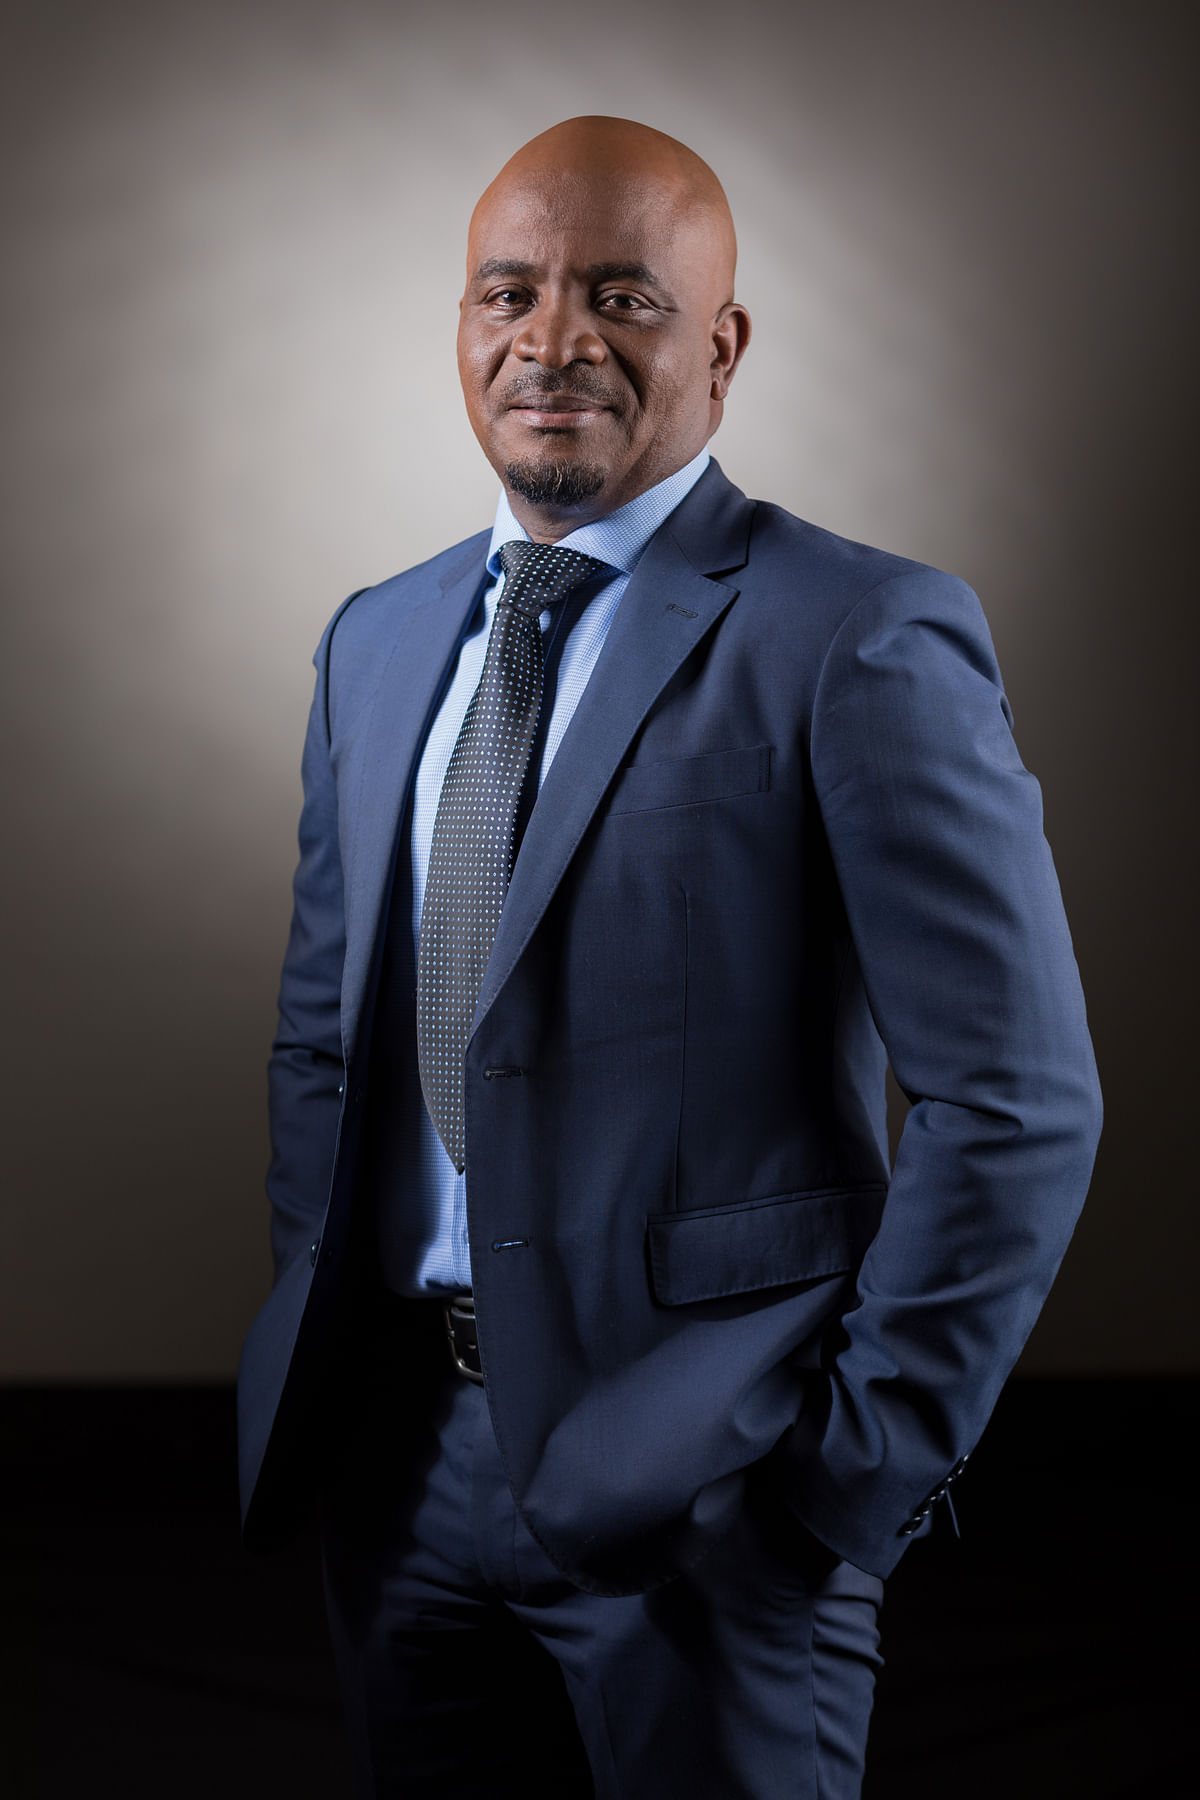 Botswana Life Insurance Limited Executive Head – Information Technology, Mr. Anderson Samu